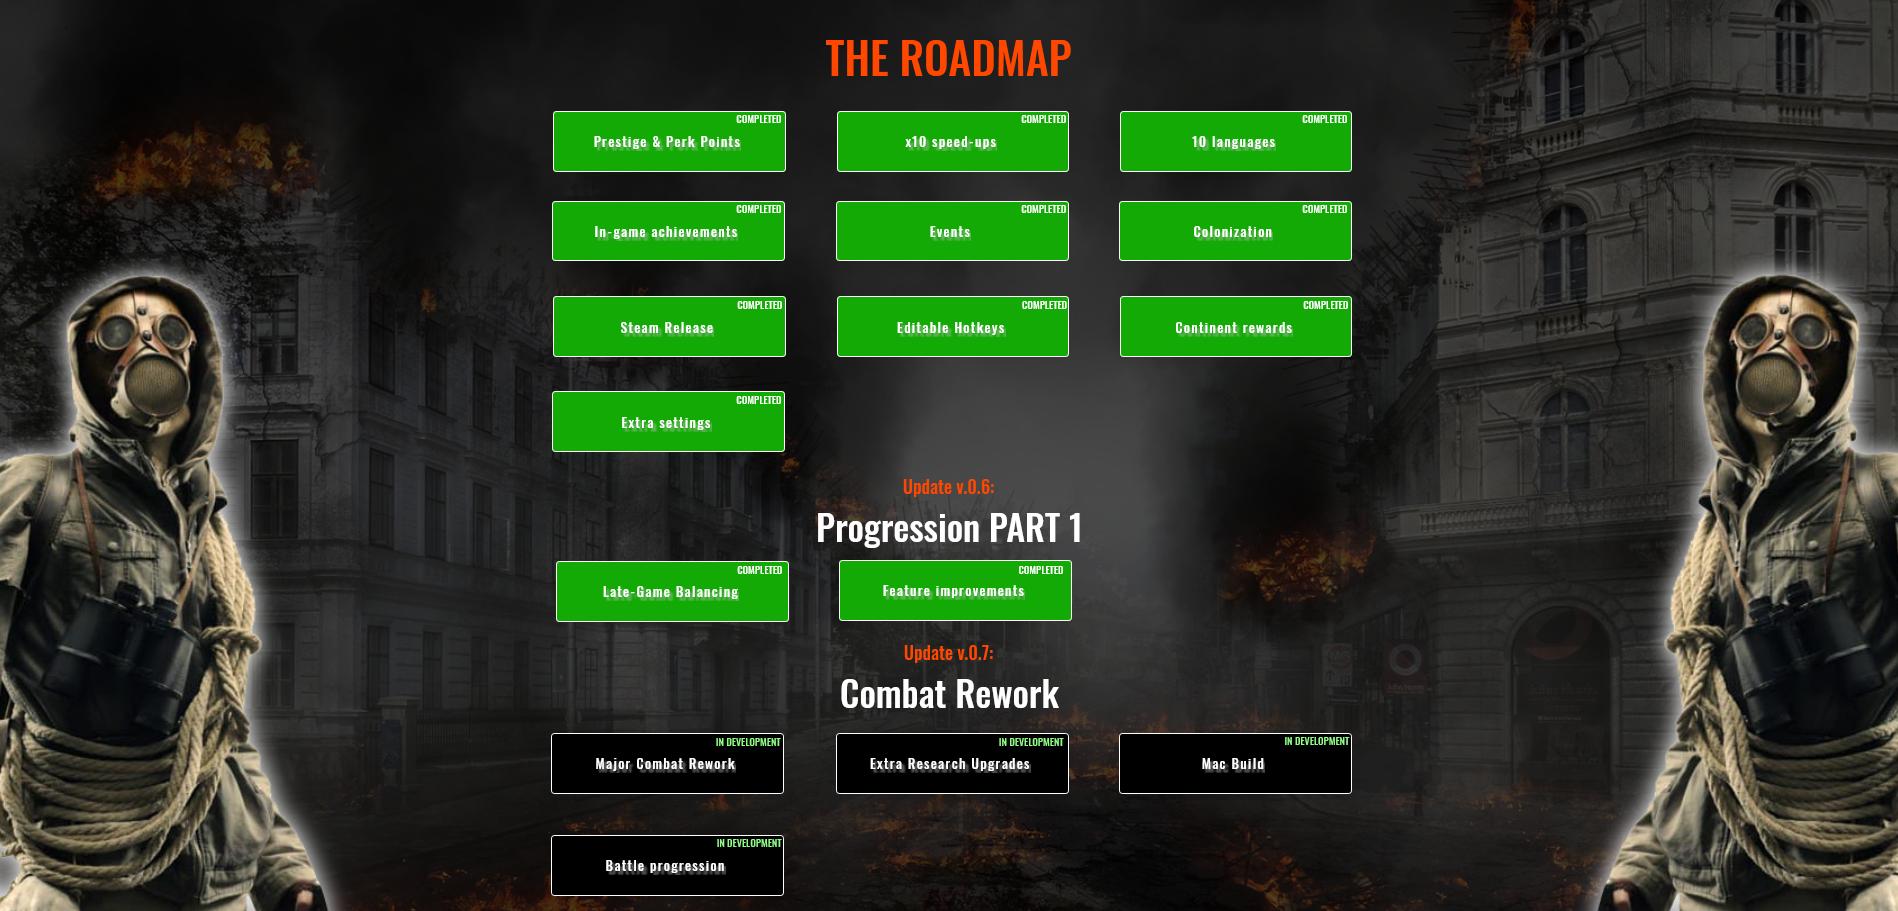 Roadmap updated